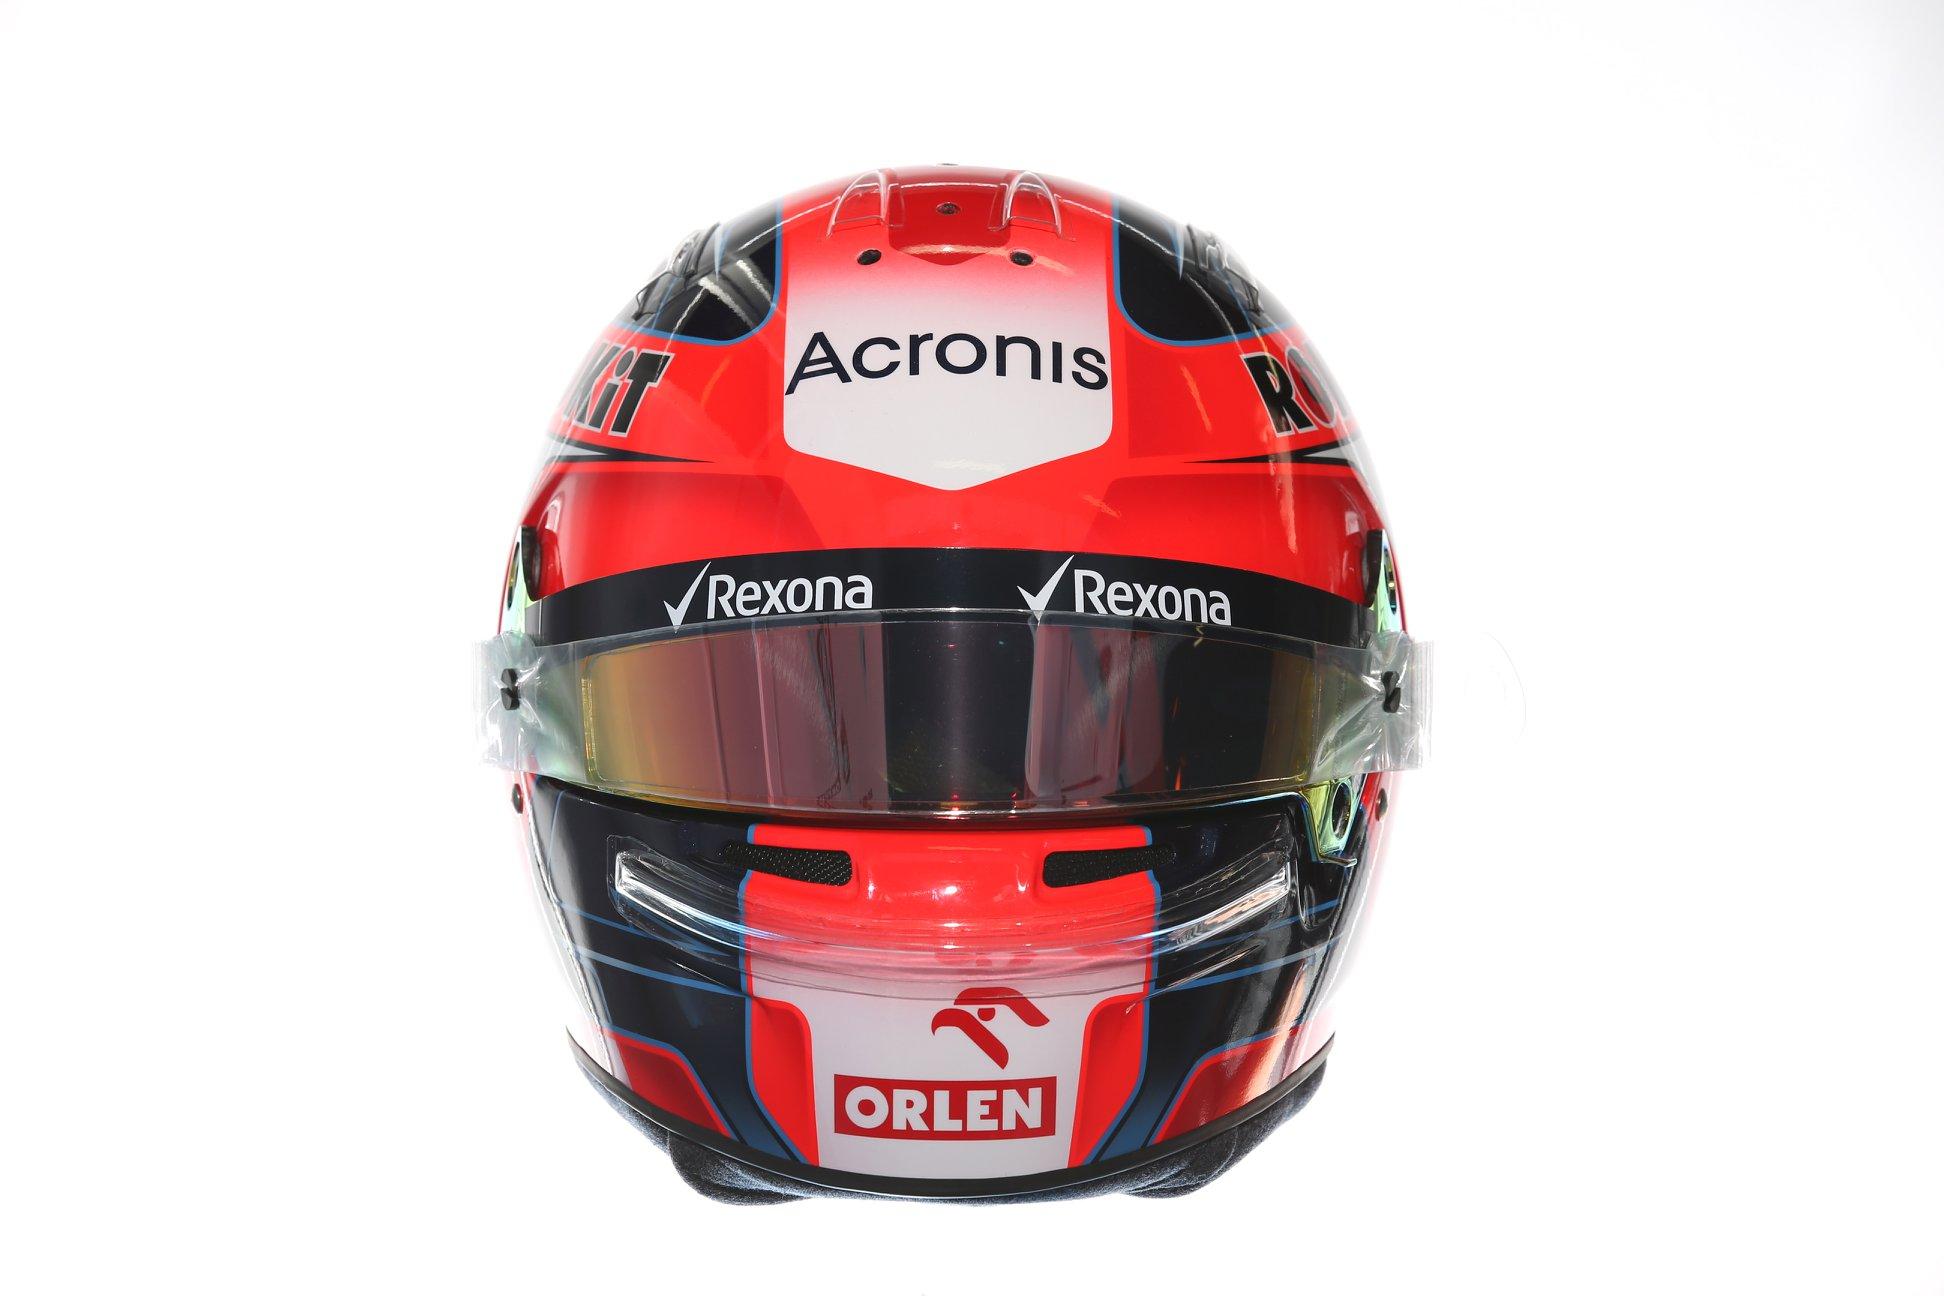 Casco Robert Kubica 2019 - Rokit Williams Racing